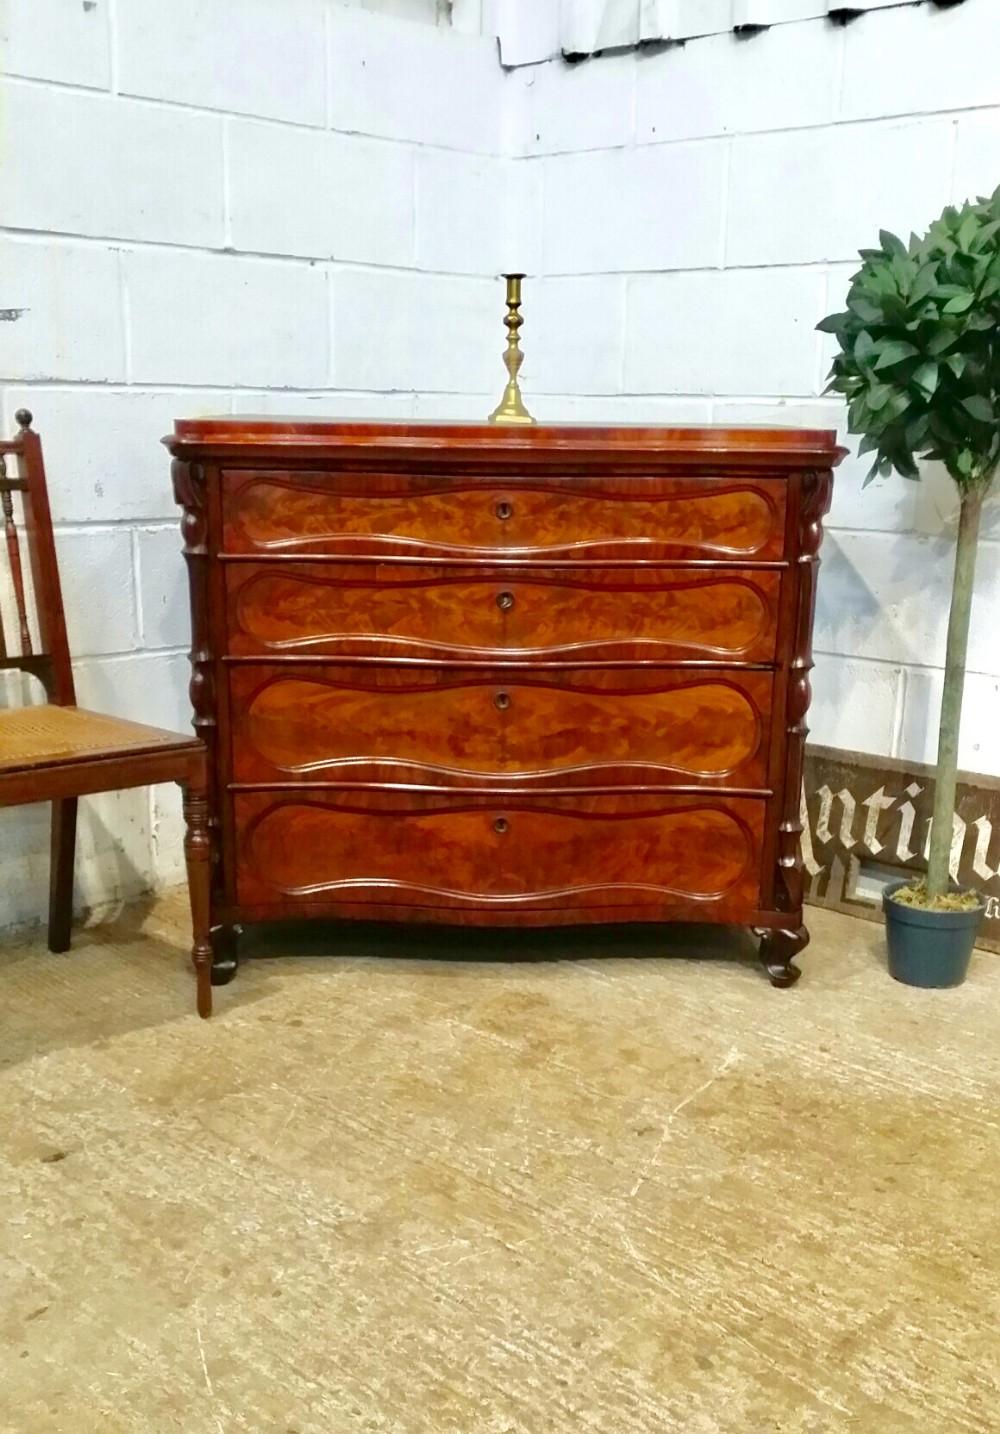 antique 19th century biedermeier serpentine front mahogany chest of drawers c1890